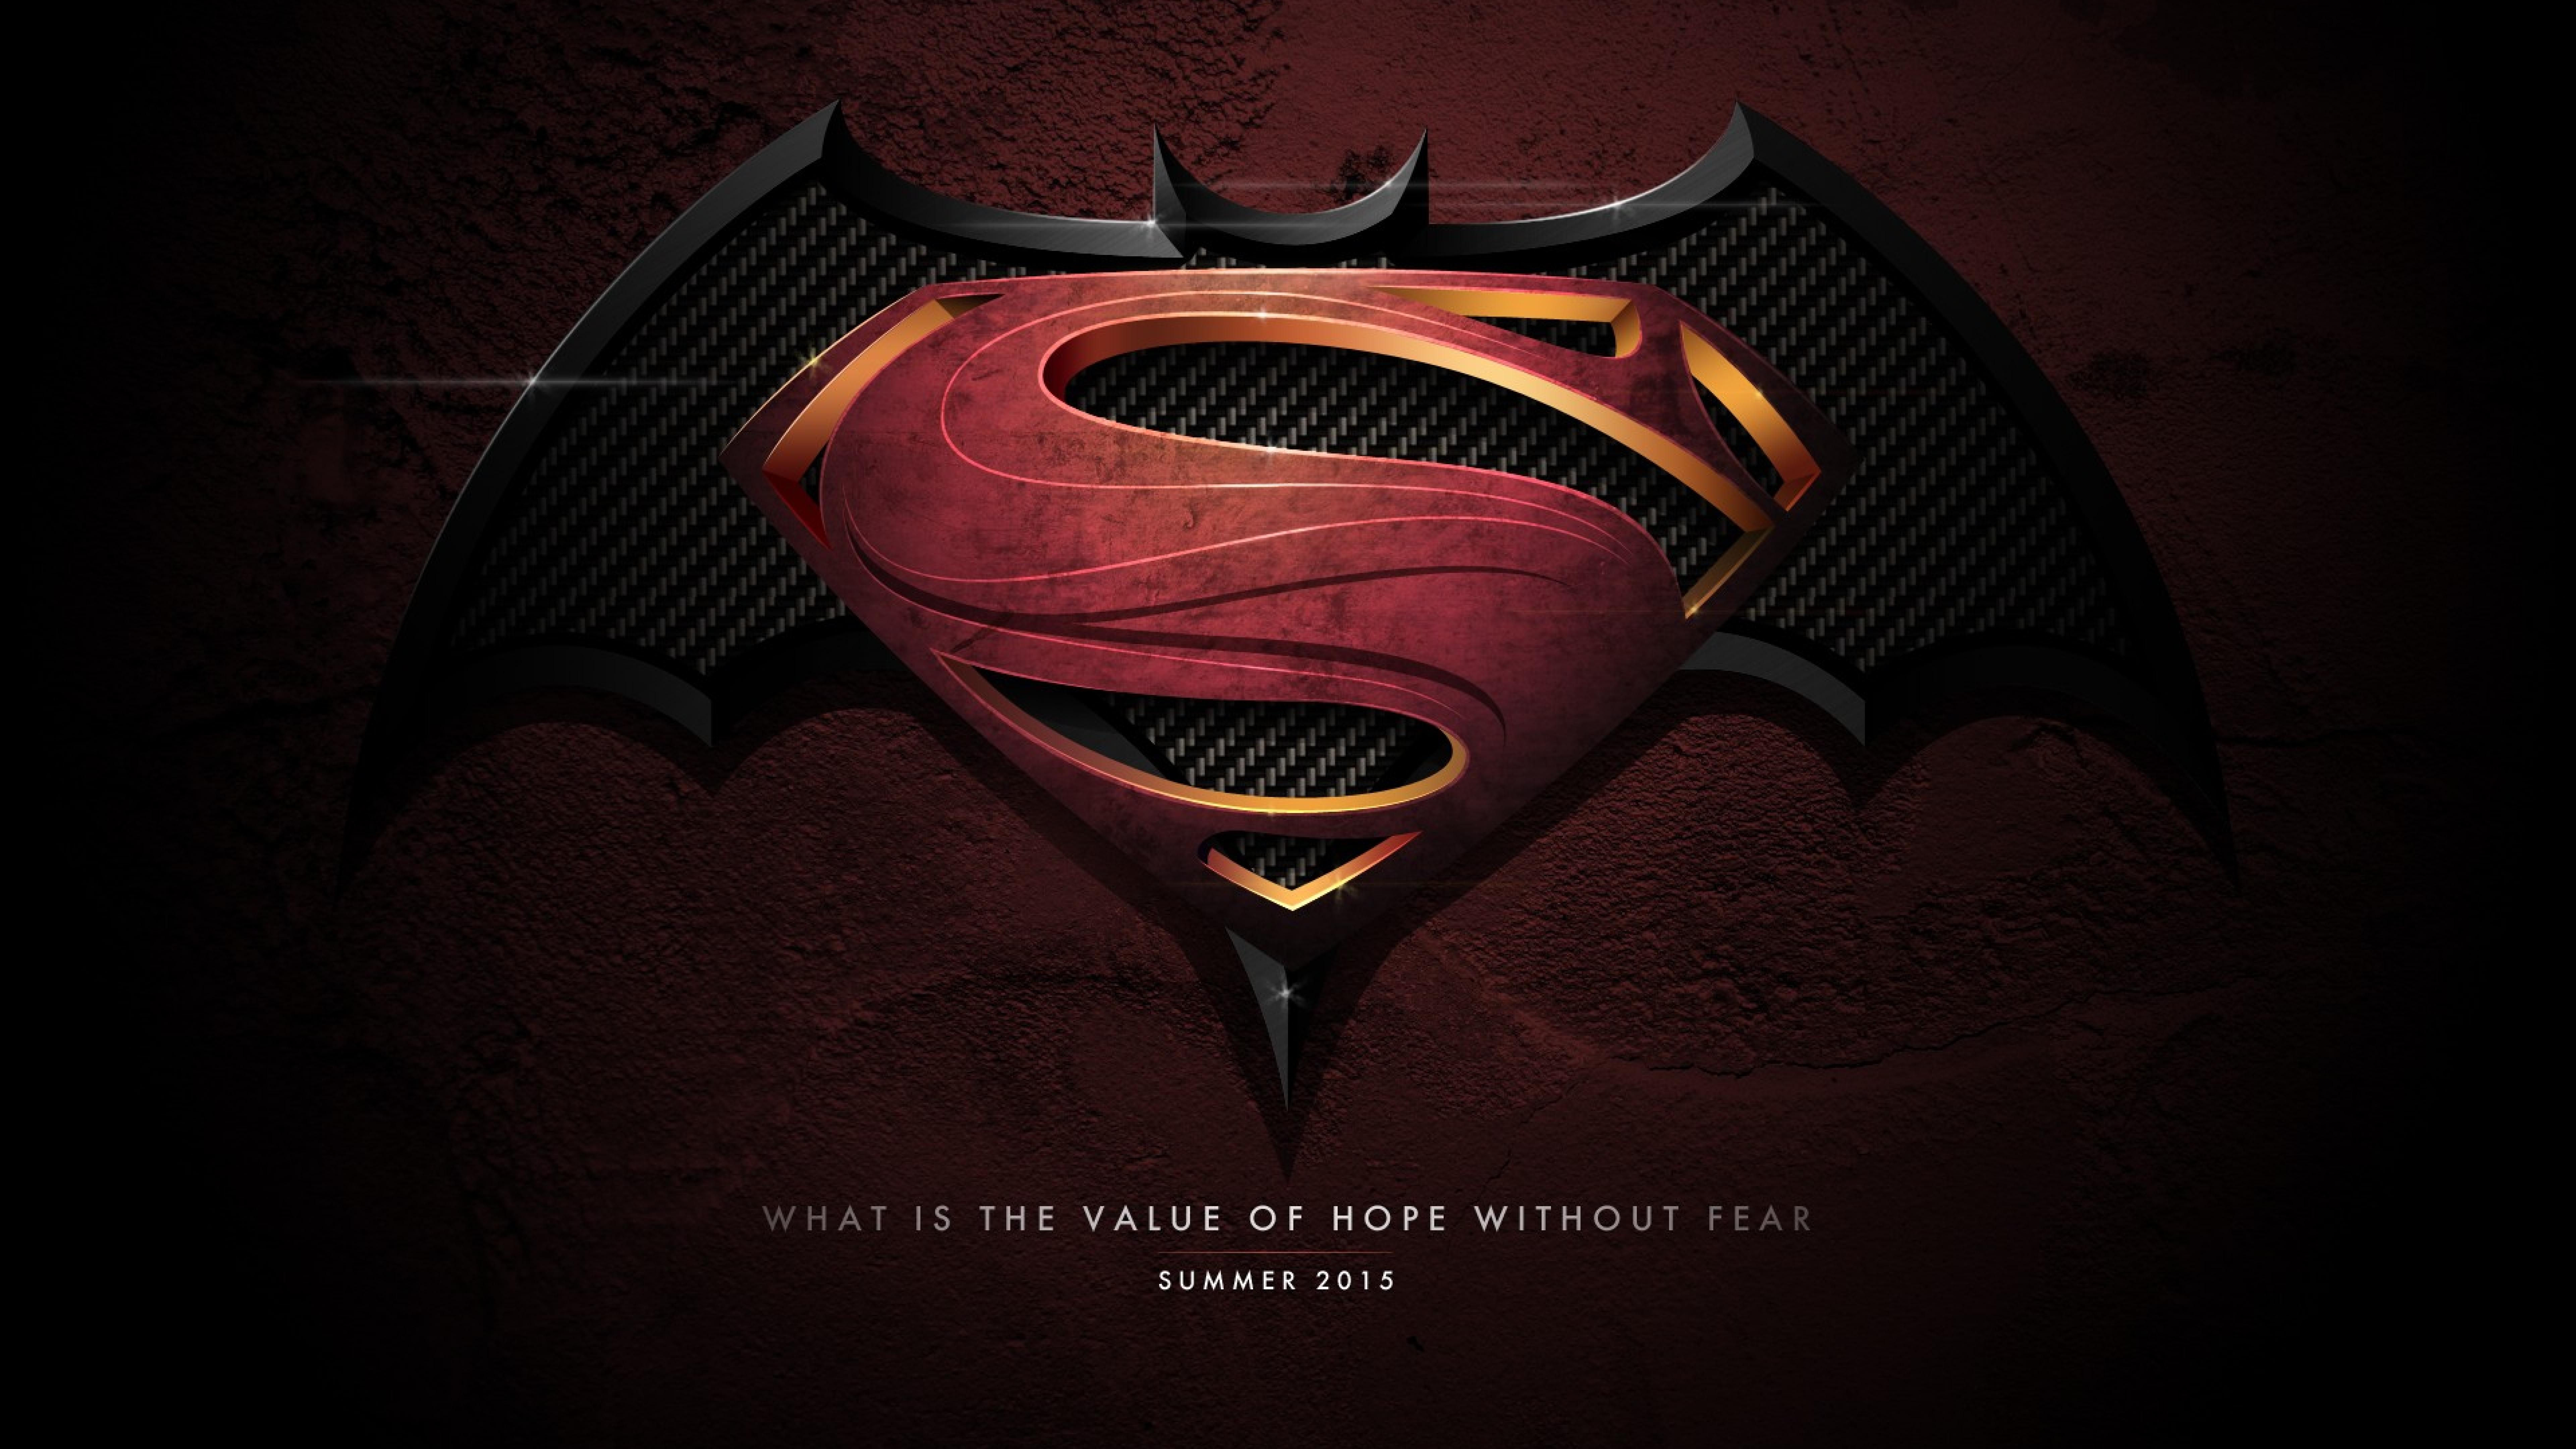 Batman Vs Superman Photoshoot, Full HD Wallpaper